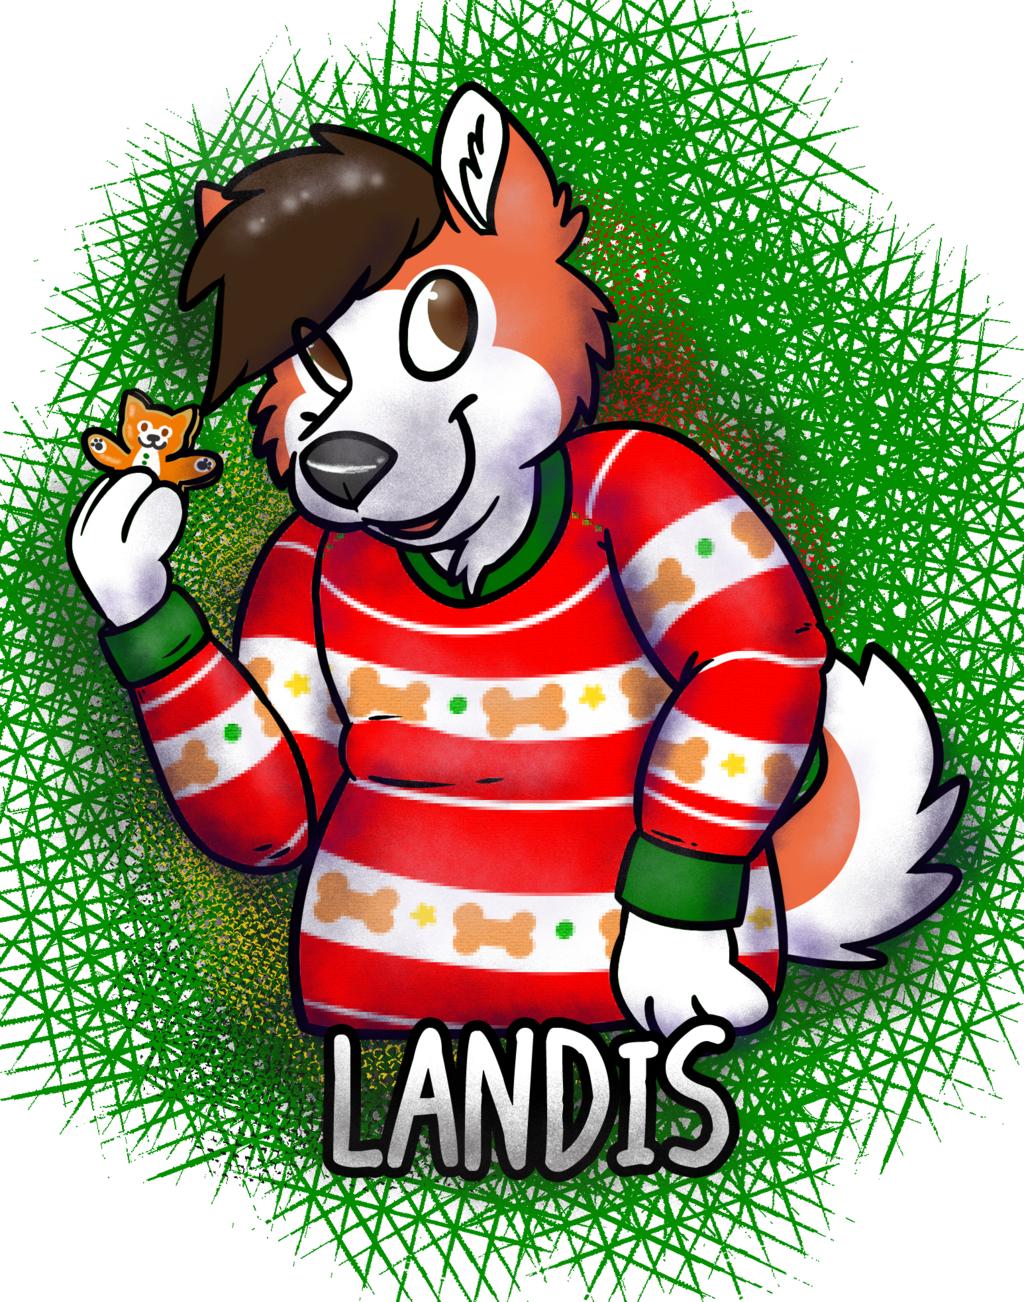 Most recent image: Landis Badge